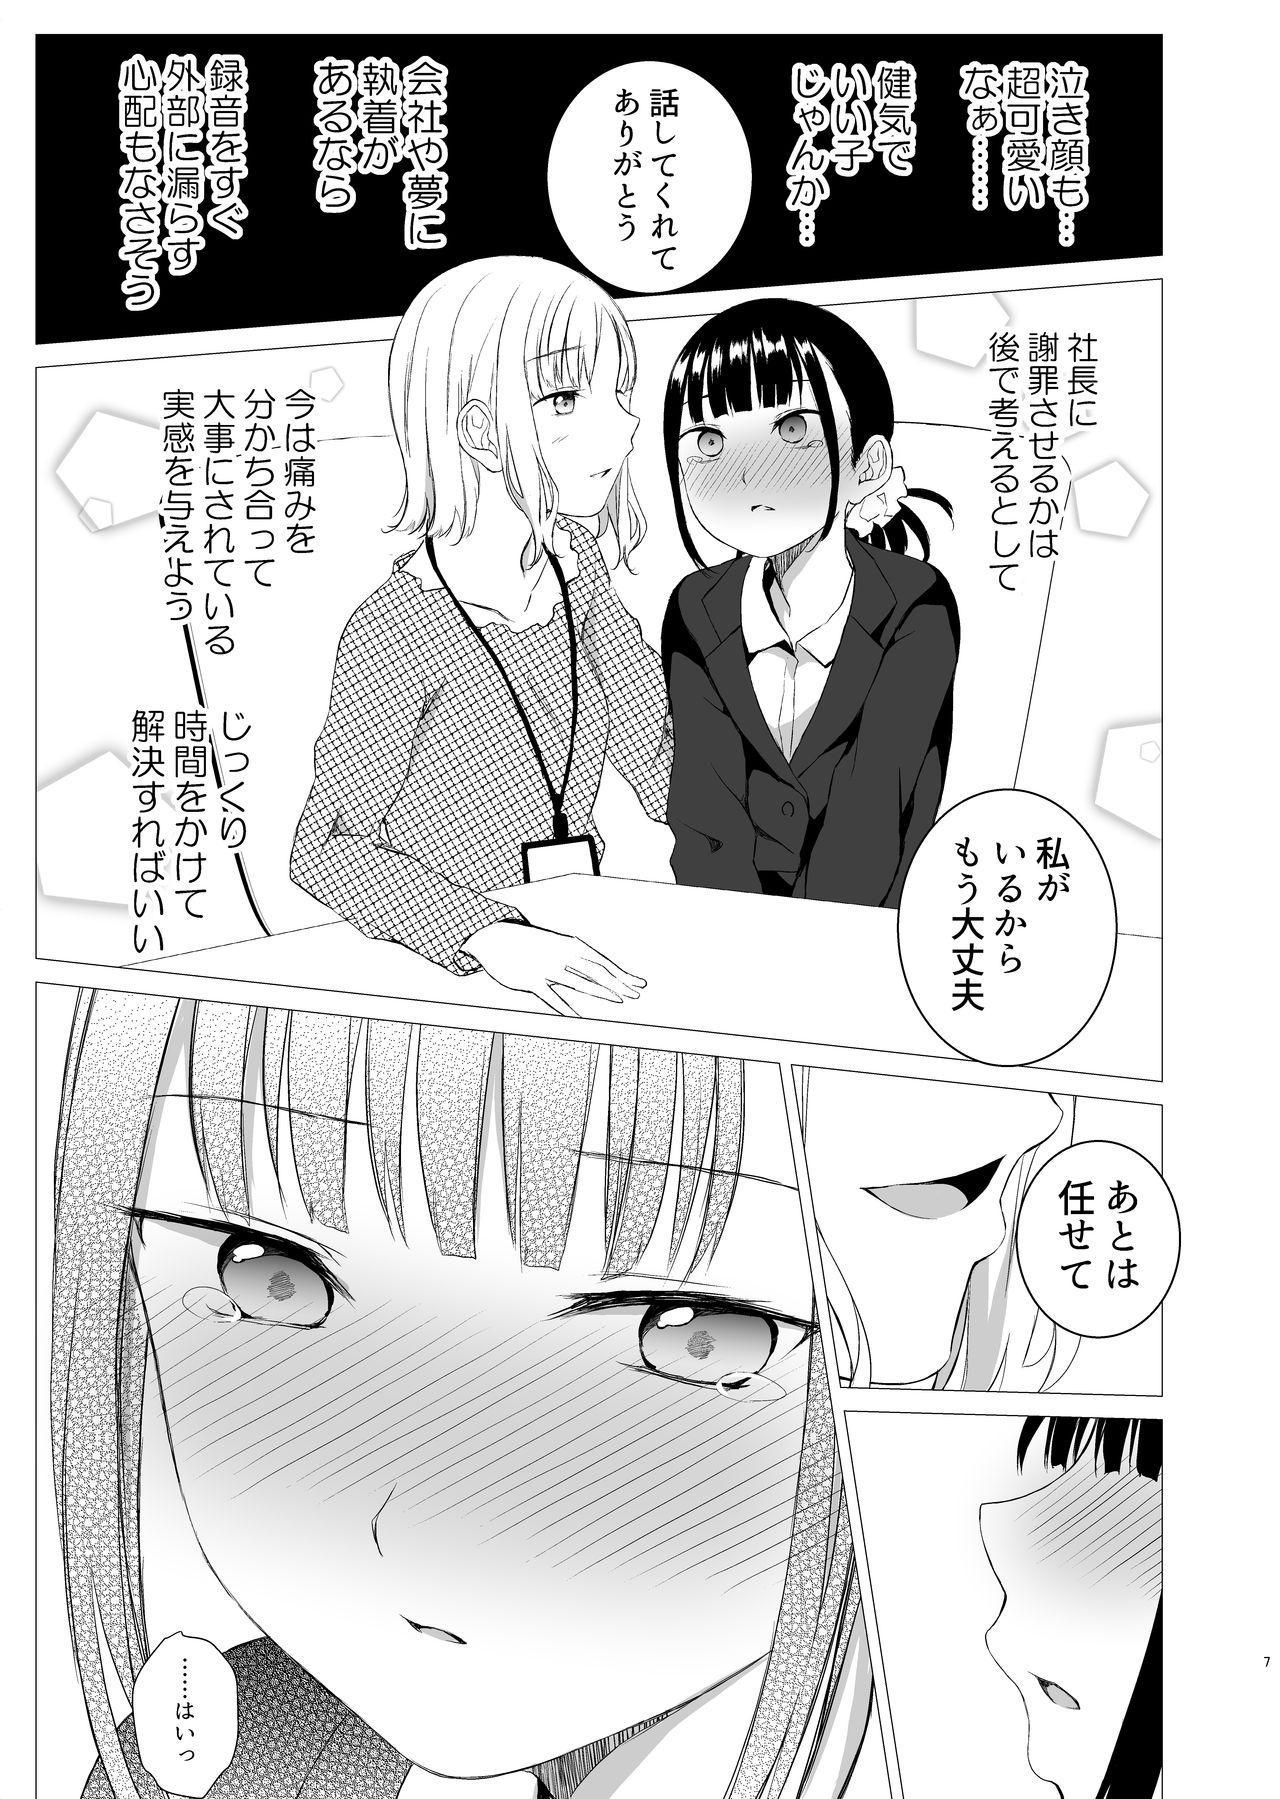 Hanayomi no Makurakotoba 5